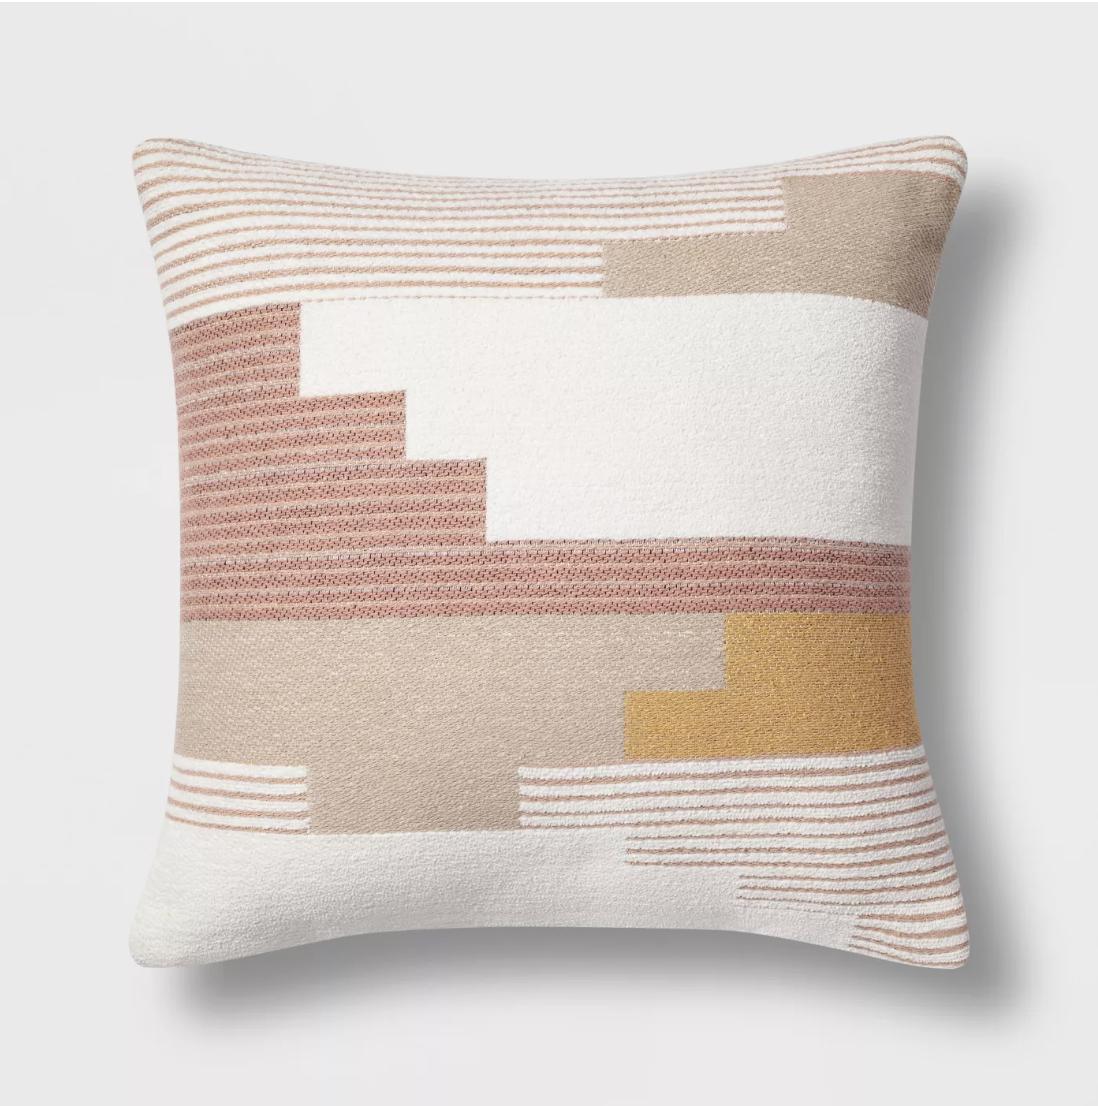 Target Southwest pillow